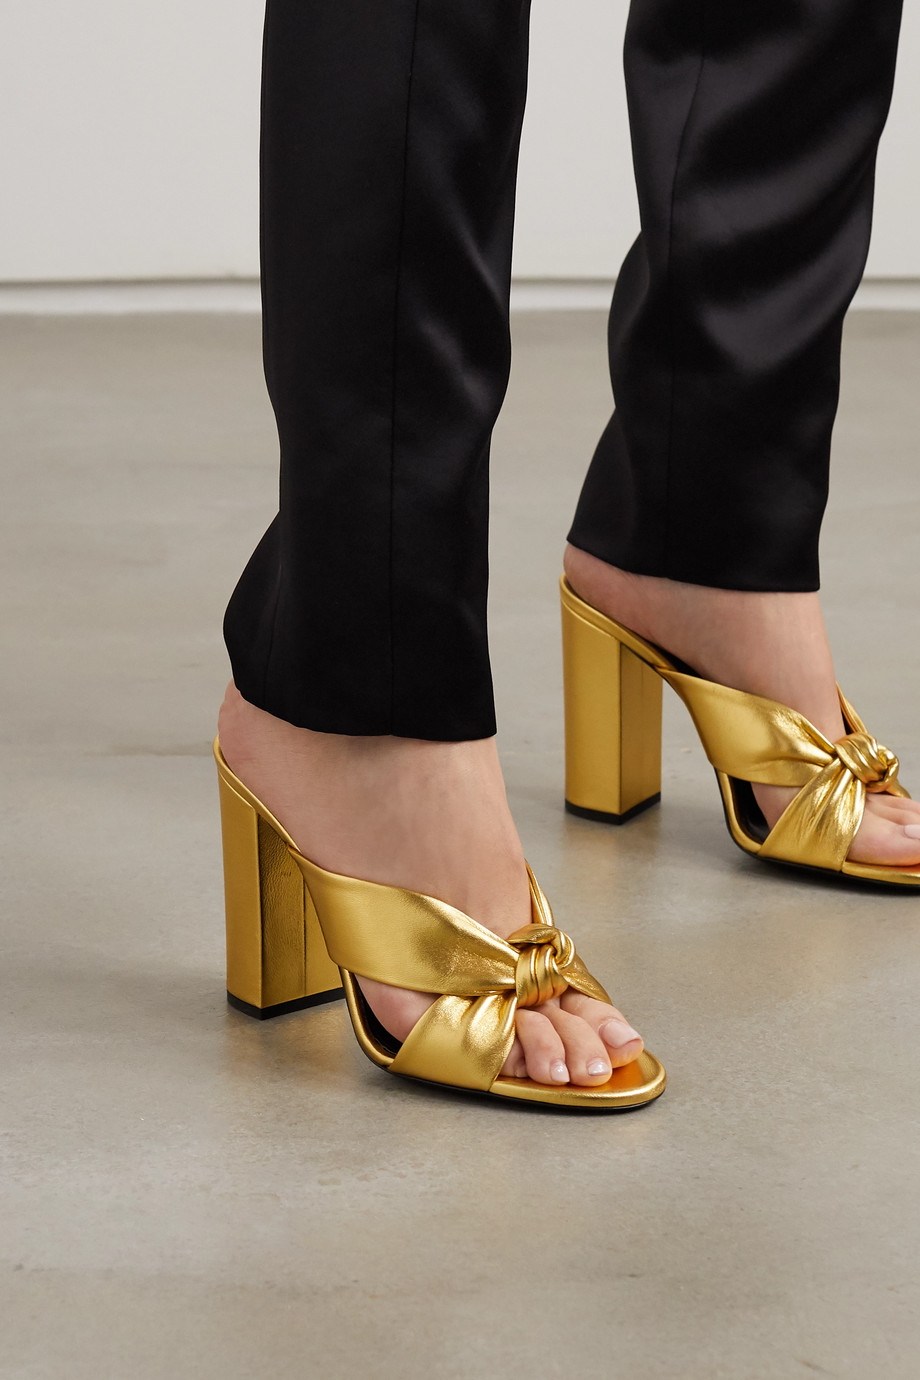 SAINT LAURENT Bianca knotted metallic leather sandals